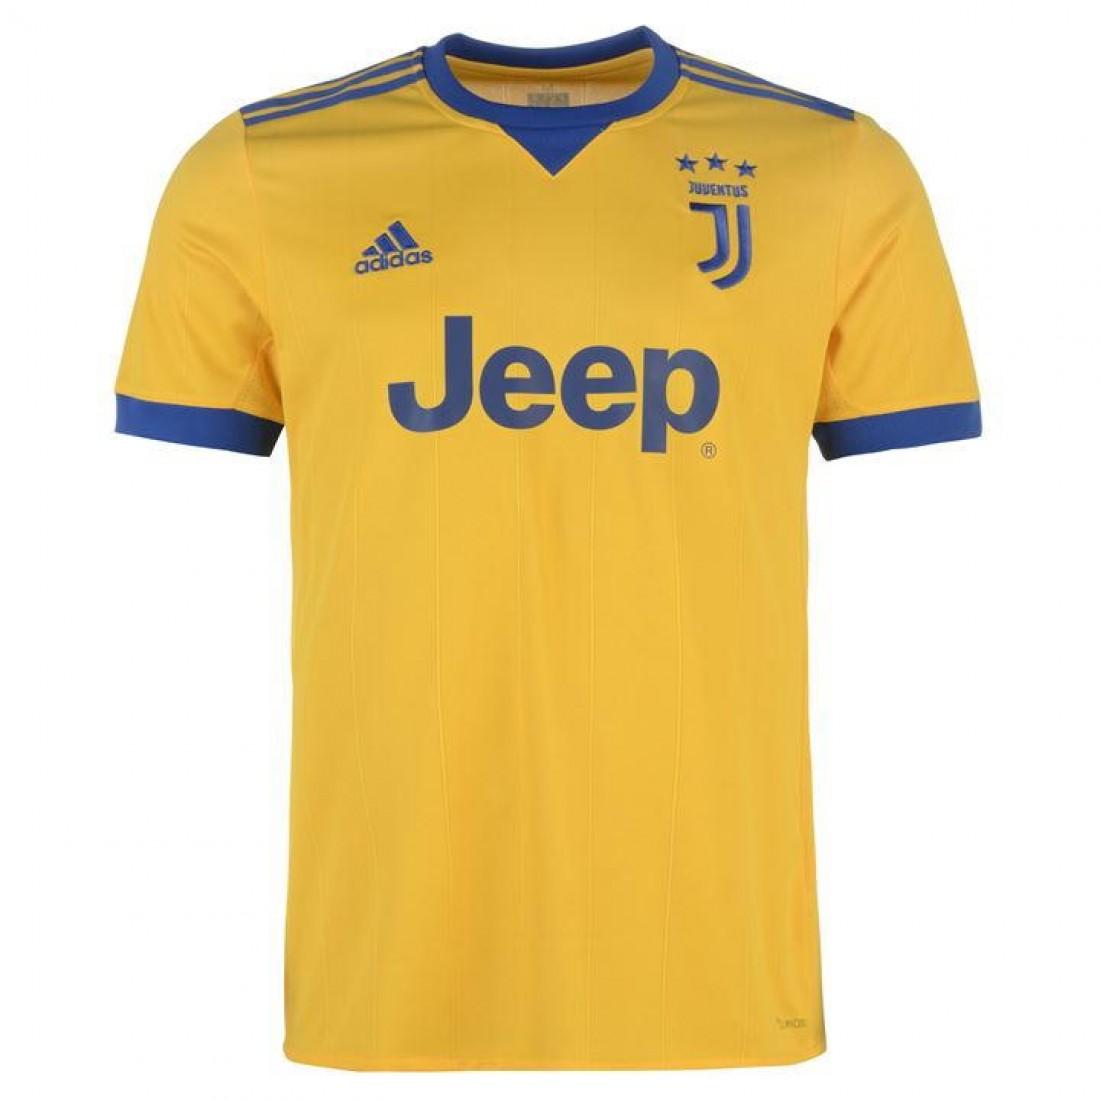 14212d9dea2 adidas Juventus детска футболна тениска Ювентус Адидас Away Shirt 2017 2018  Junior оригинална